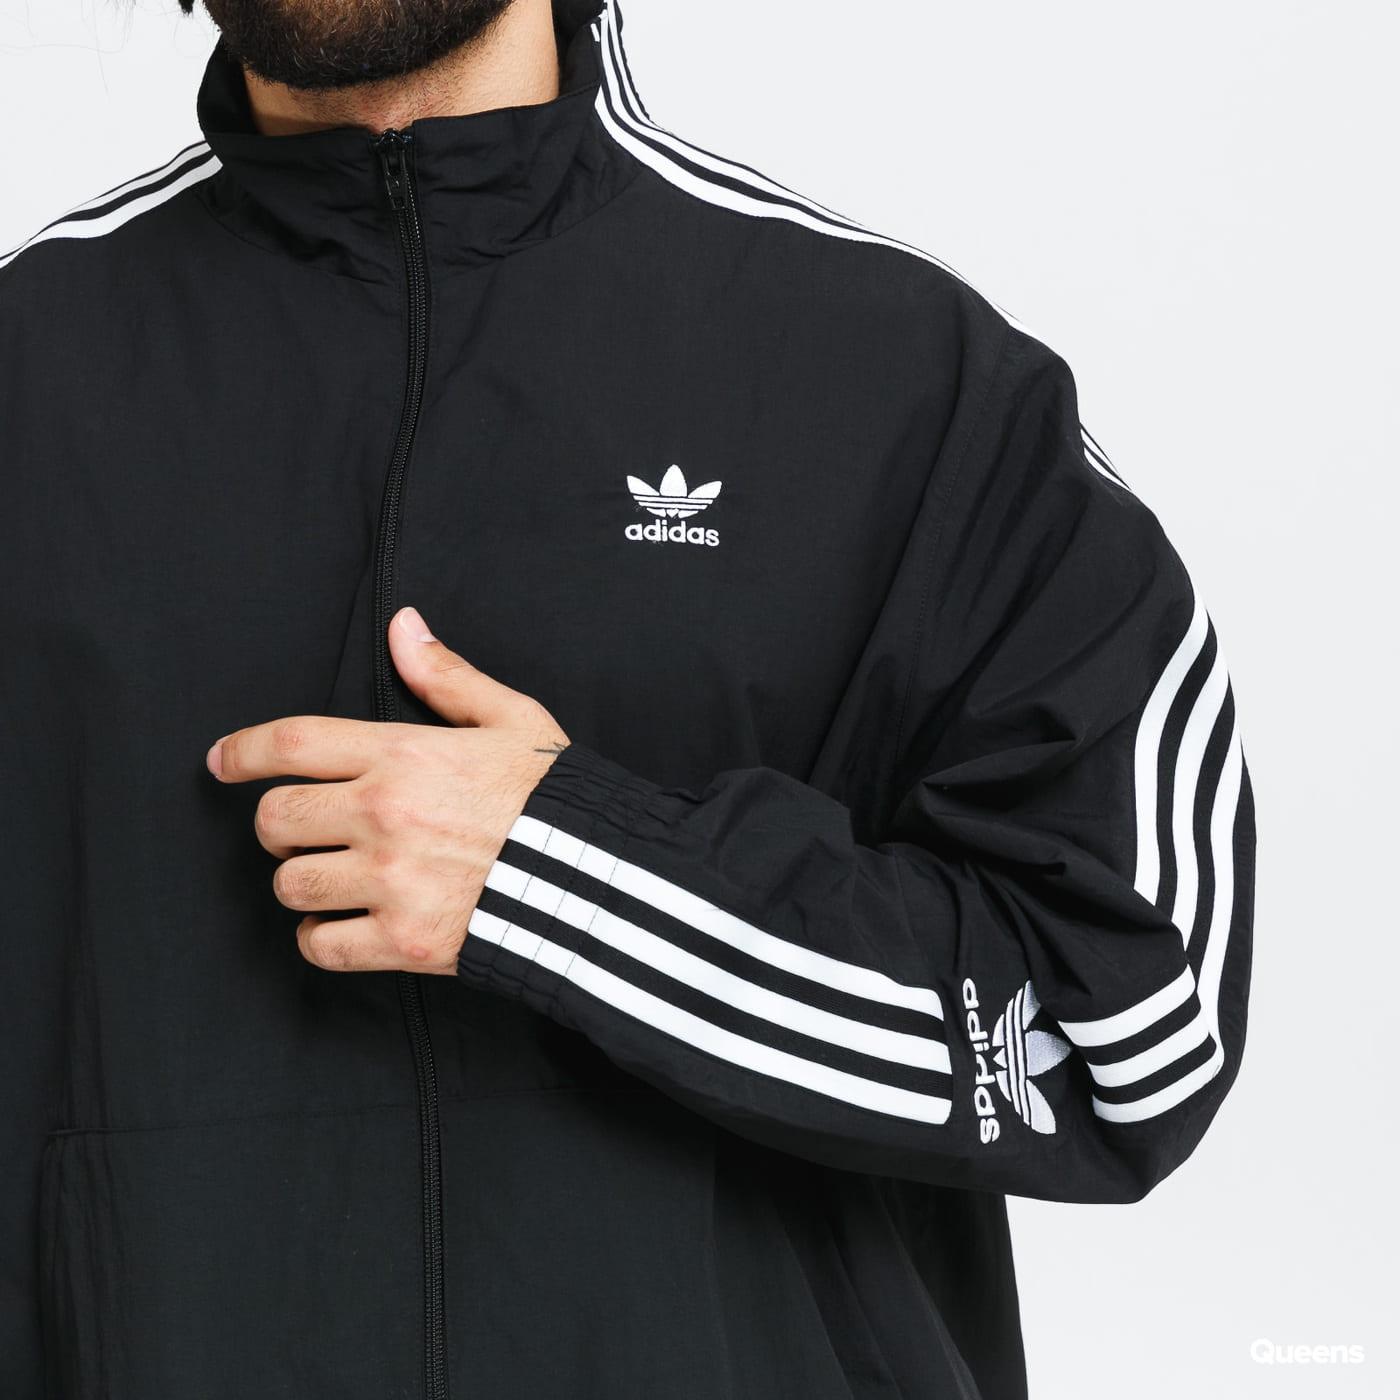 adidas Originals Lock Up TT gray / beige / pink / black